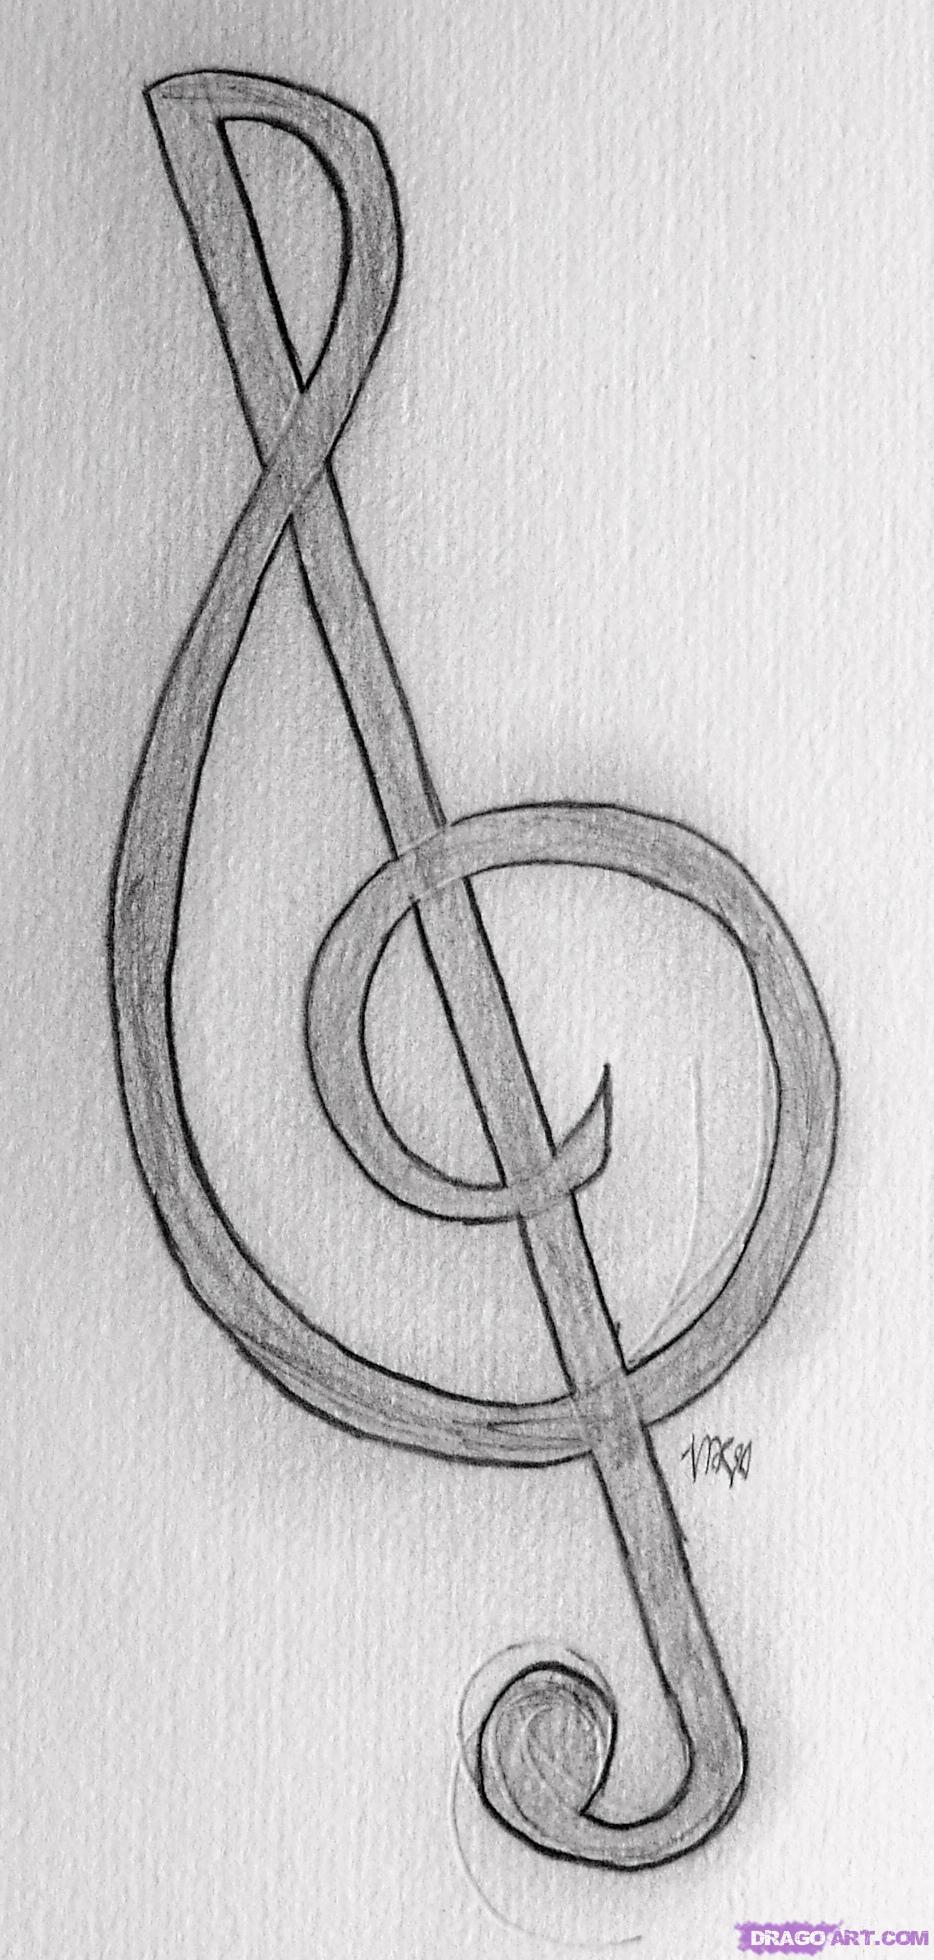 Drawn musician easy Draw Treble Step how Draw